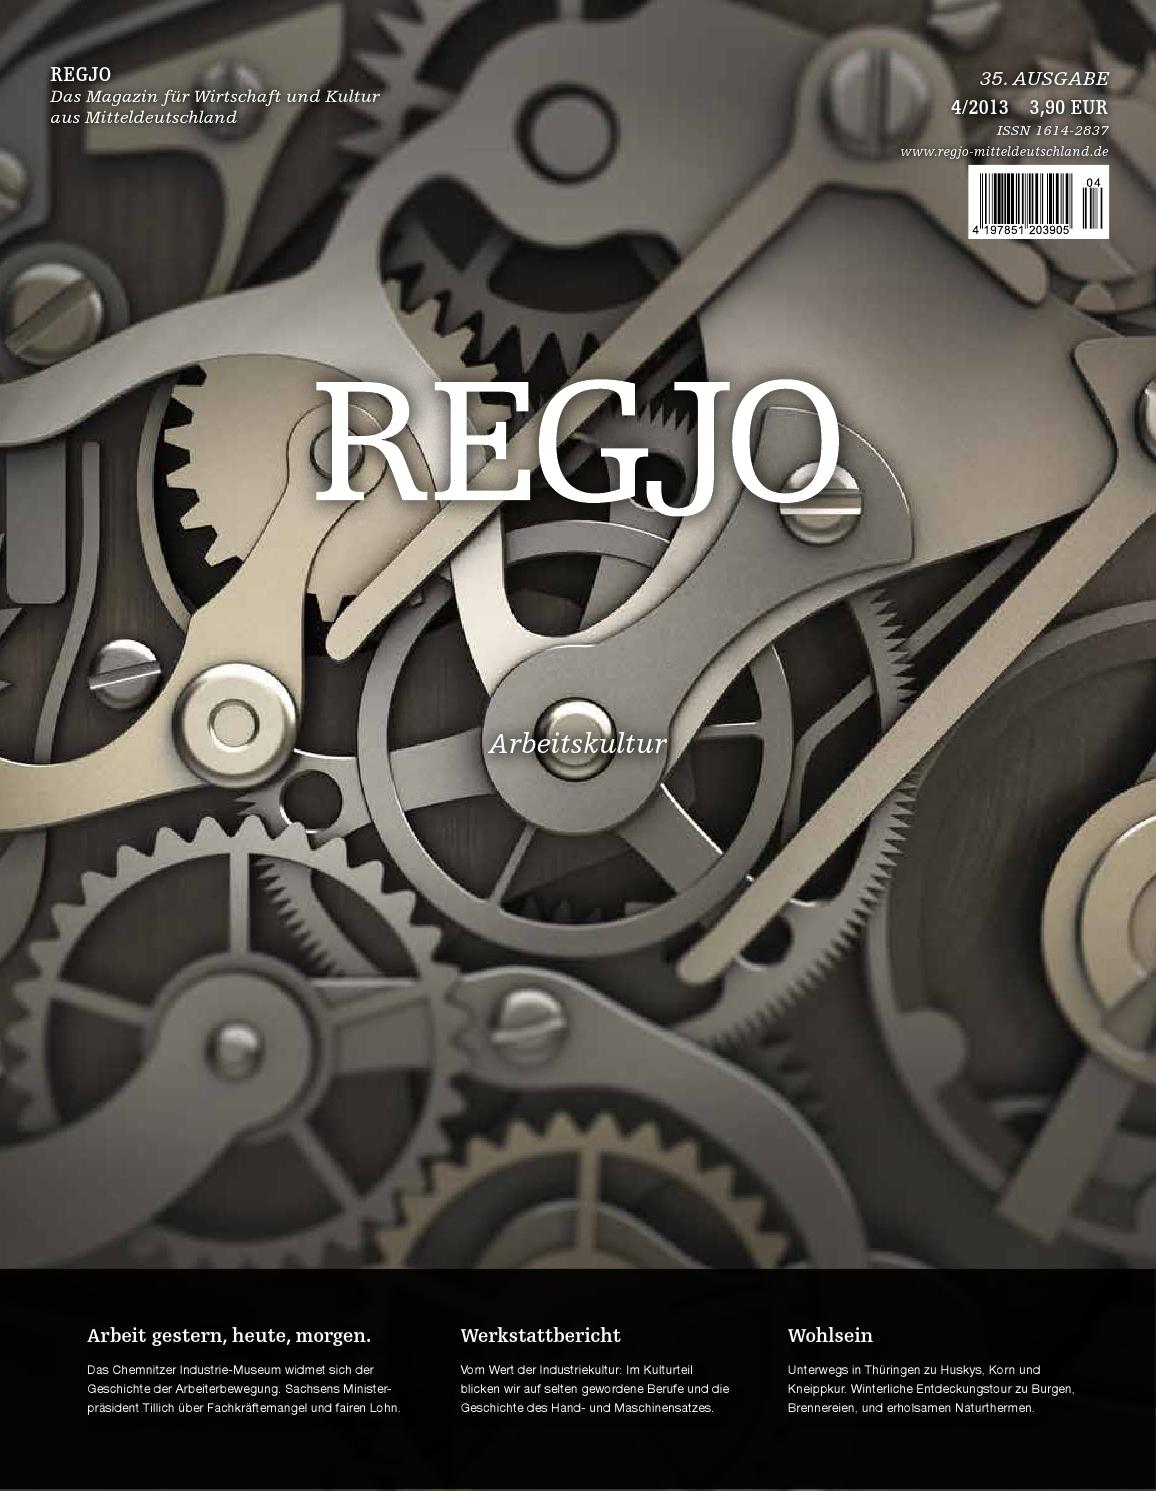 REGJO 01/2013 by REGJO Magazin Verlag Mitteldeutschland - issuu